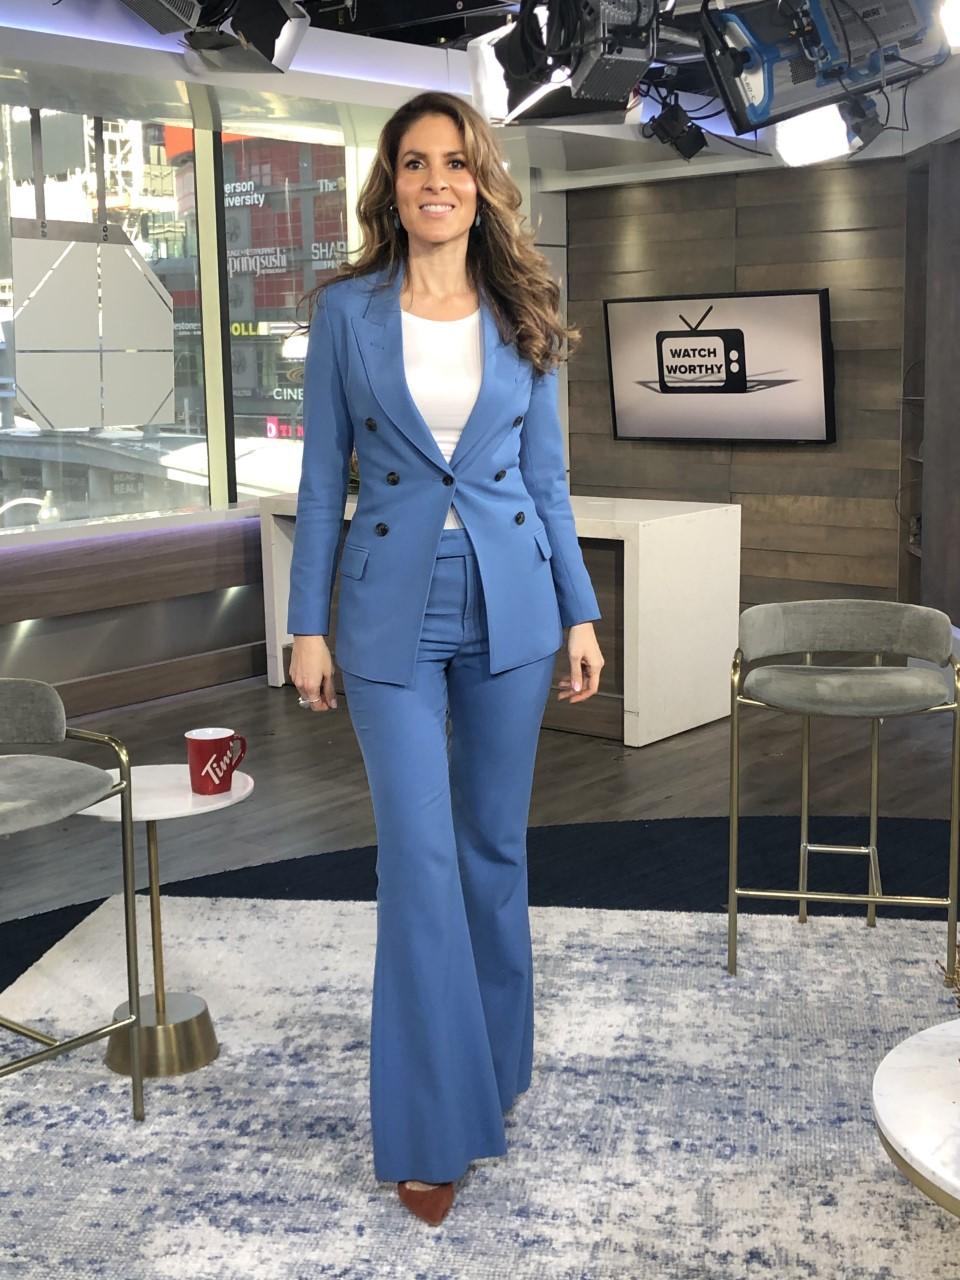 Dina wearing blue blazer and pants ensemble - 2